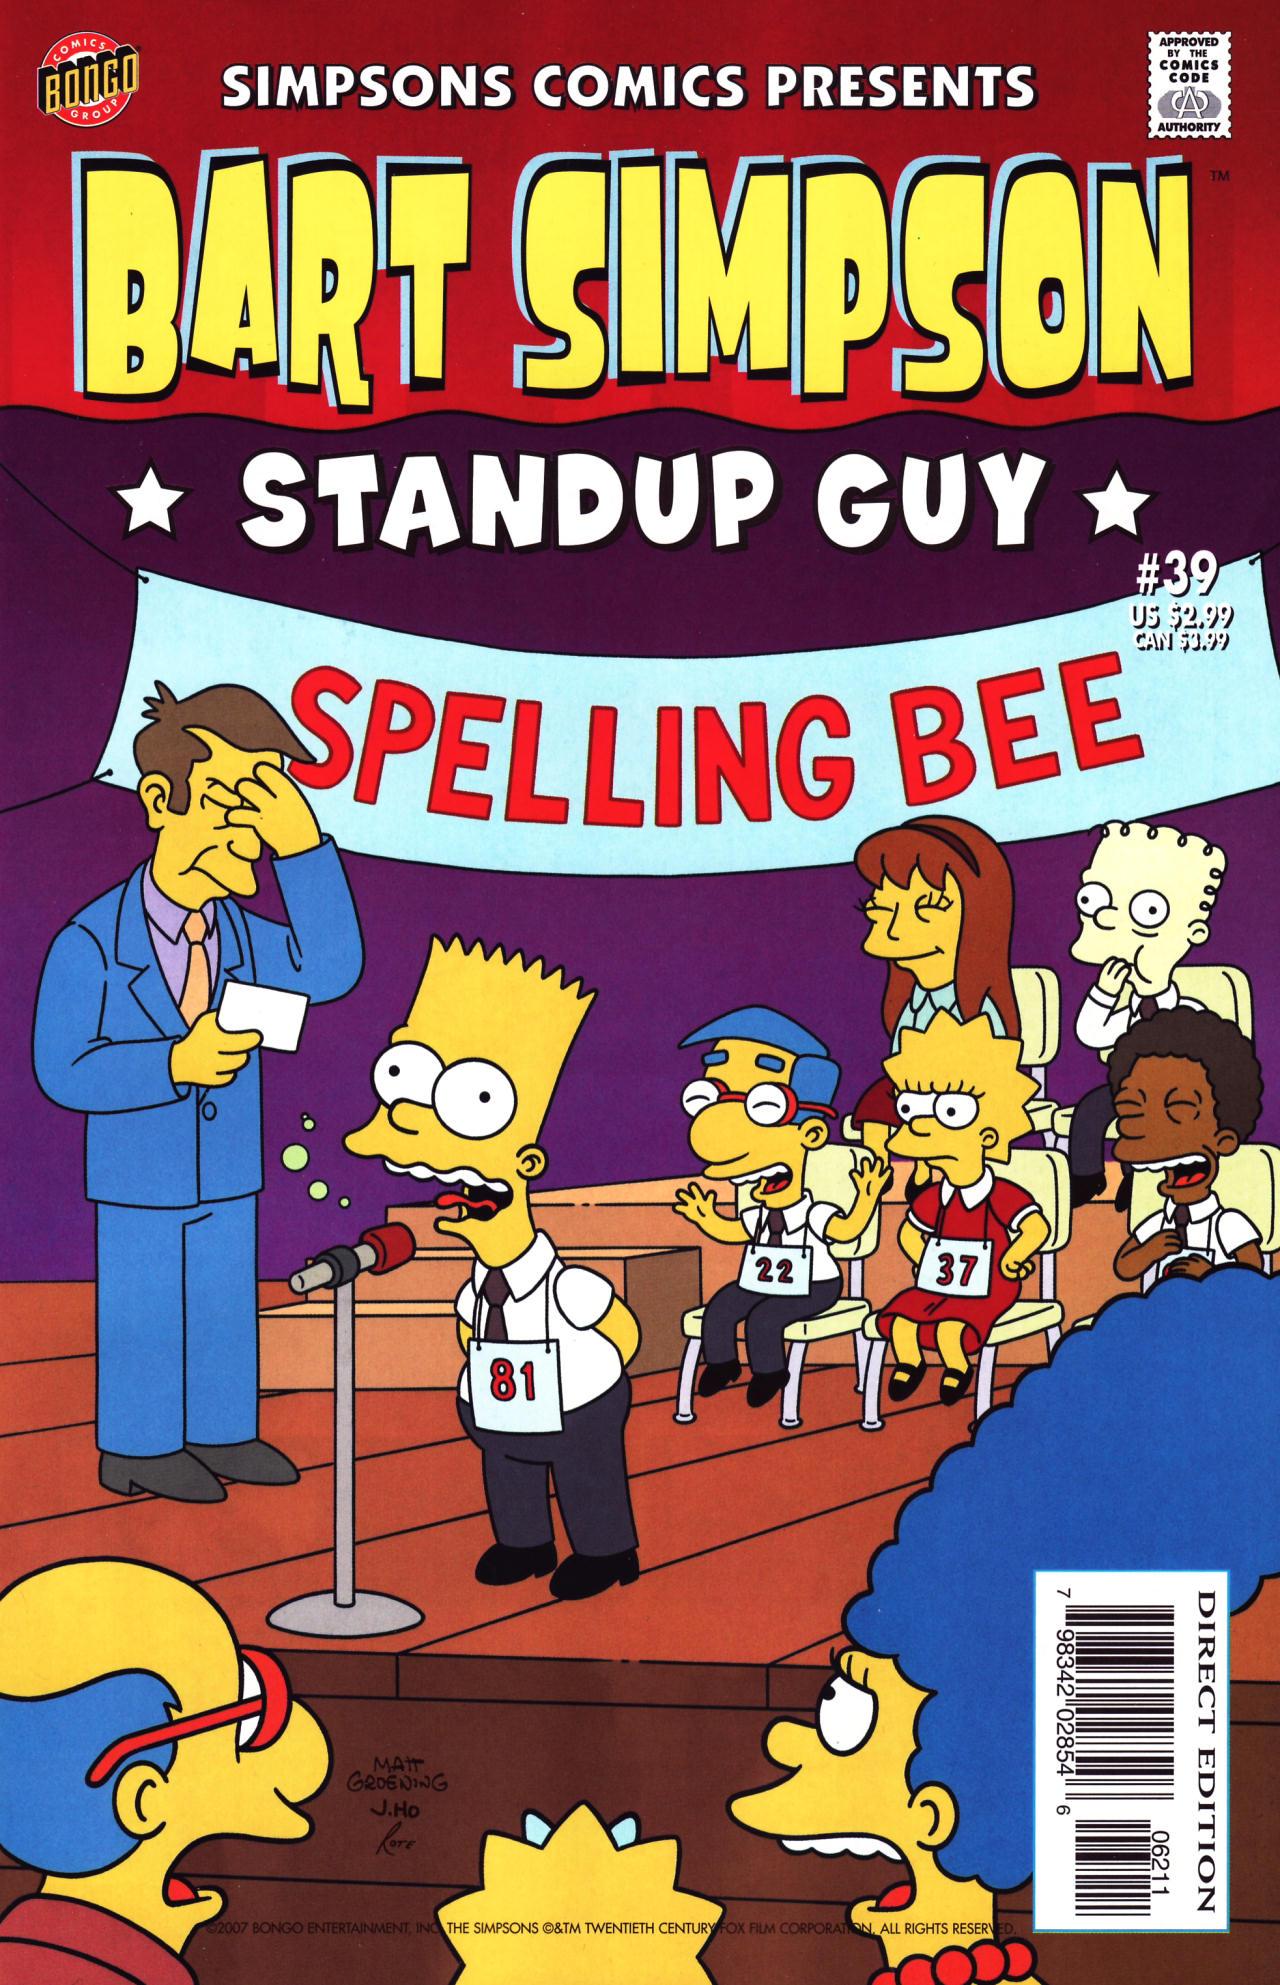 Read online Simpsons Comics Presents Bart Simpson comic -  Issue #39 - 1